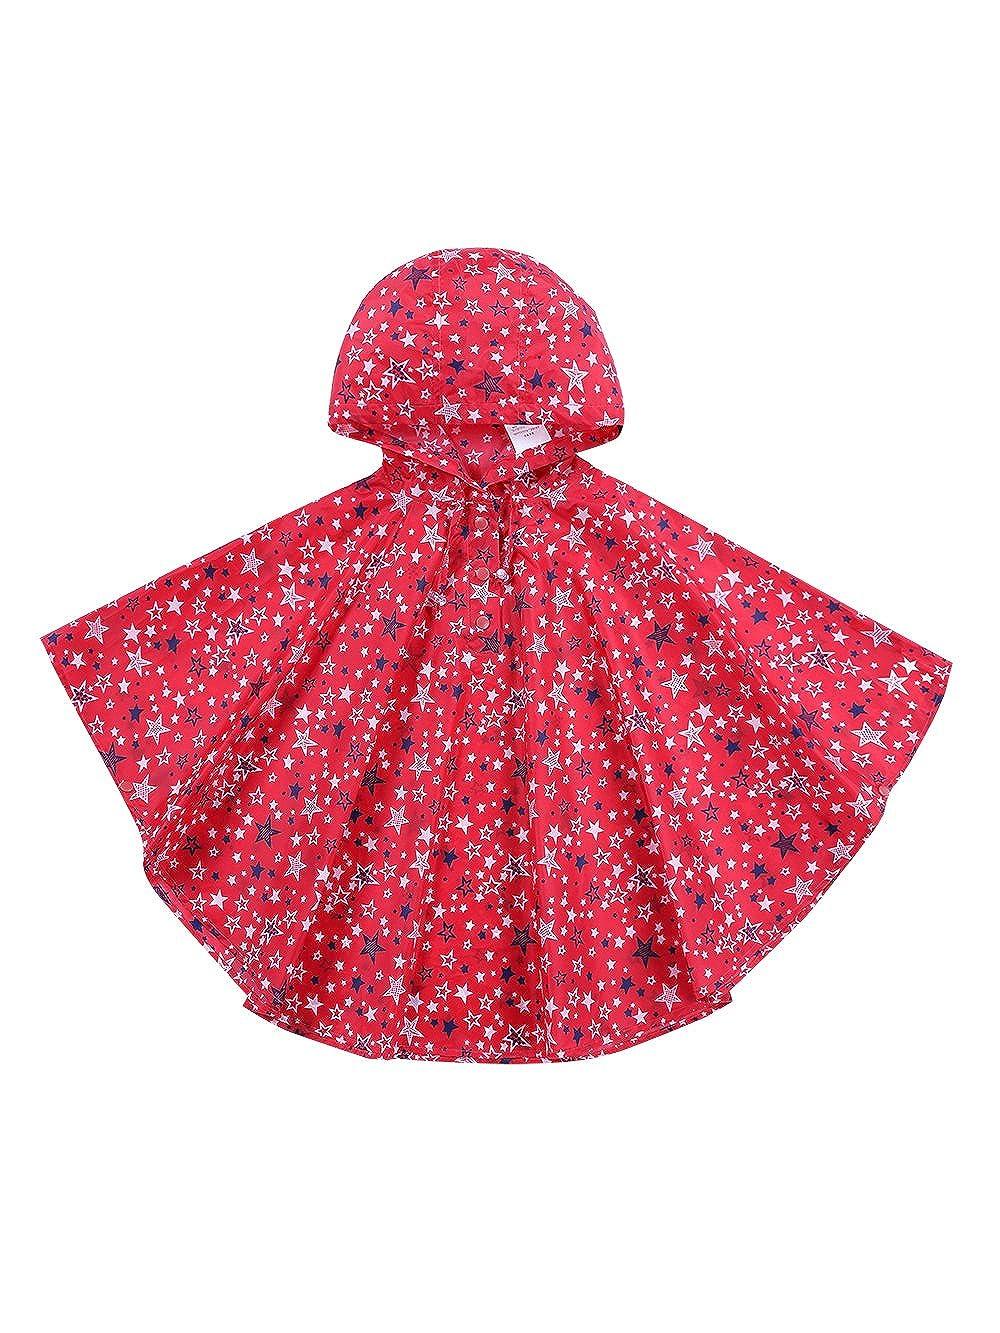 URBEAR Boys Girls Waterproof Raincoats Kids' Toddler Hooded School Backpack Lightweight Ponchos Jacket, S-XL B80603XX